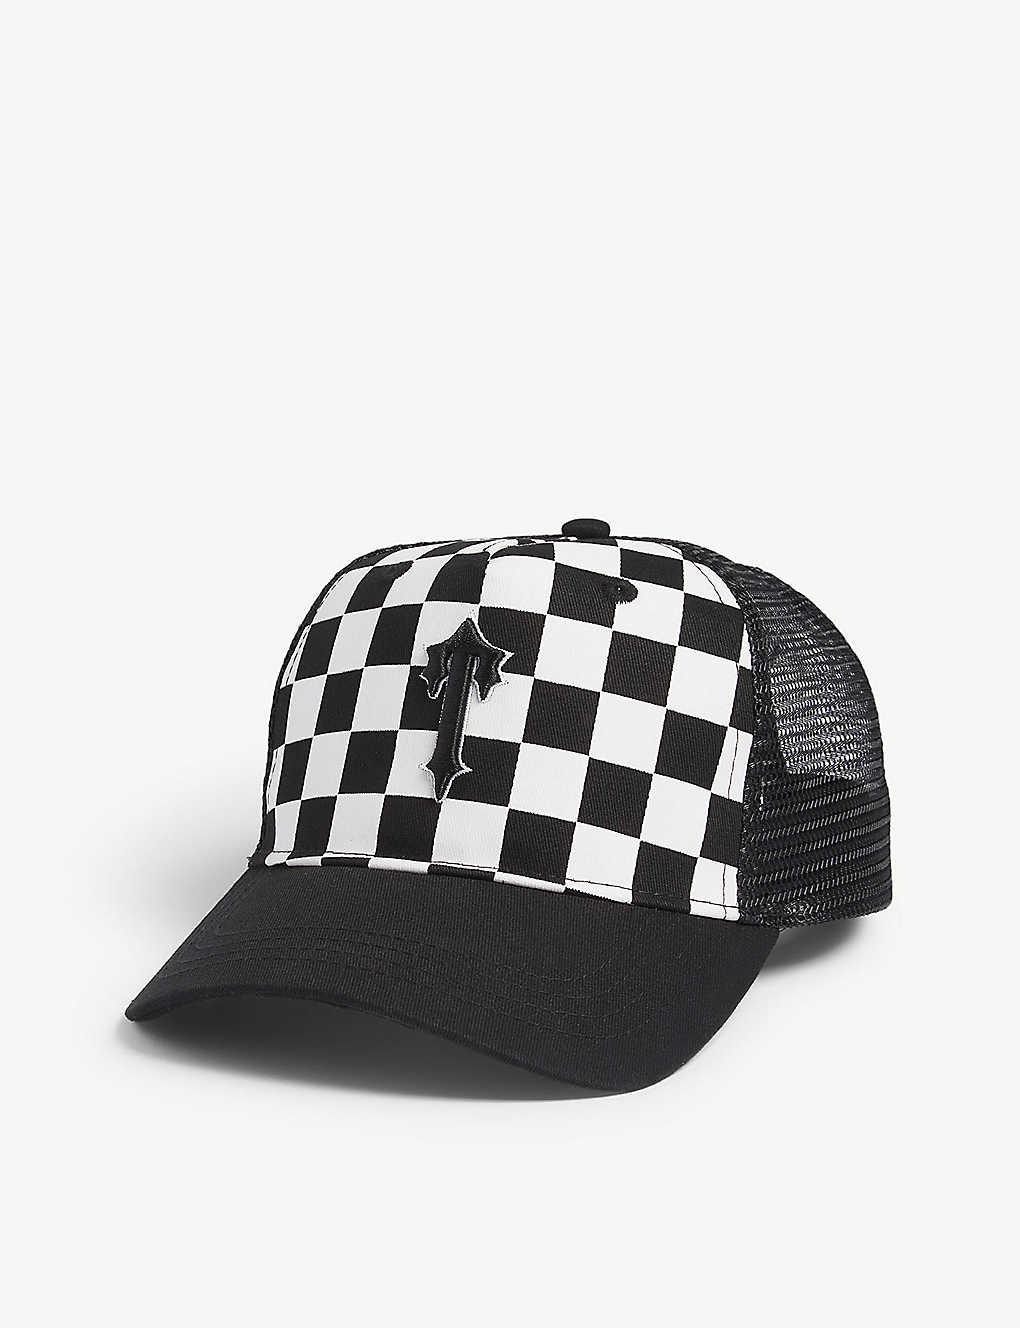 697b2095d3639 Checkered mesh snapback cap - Black white ...